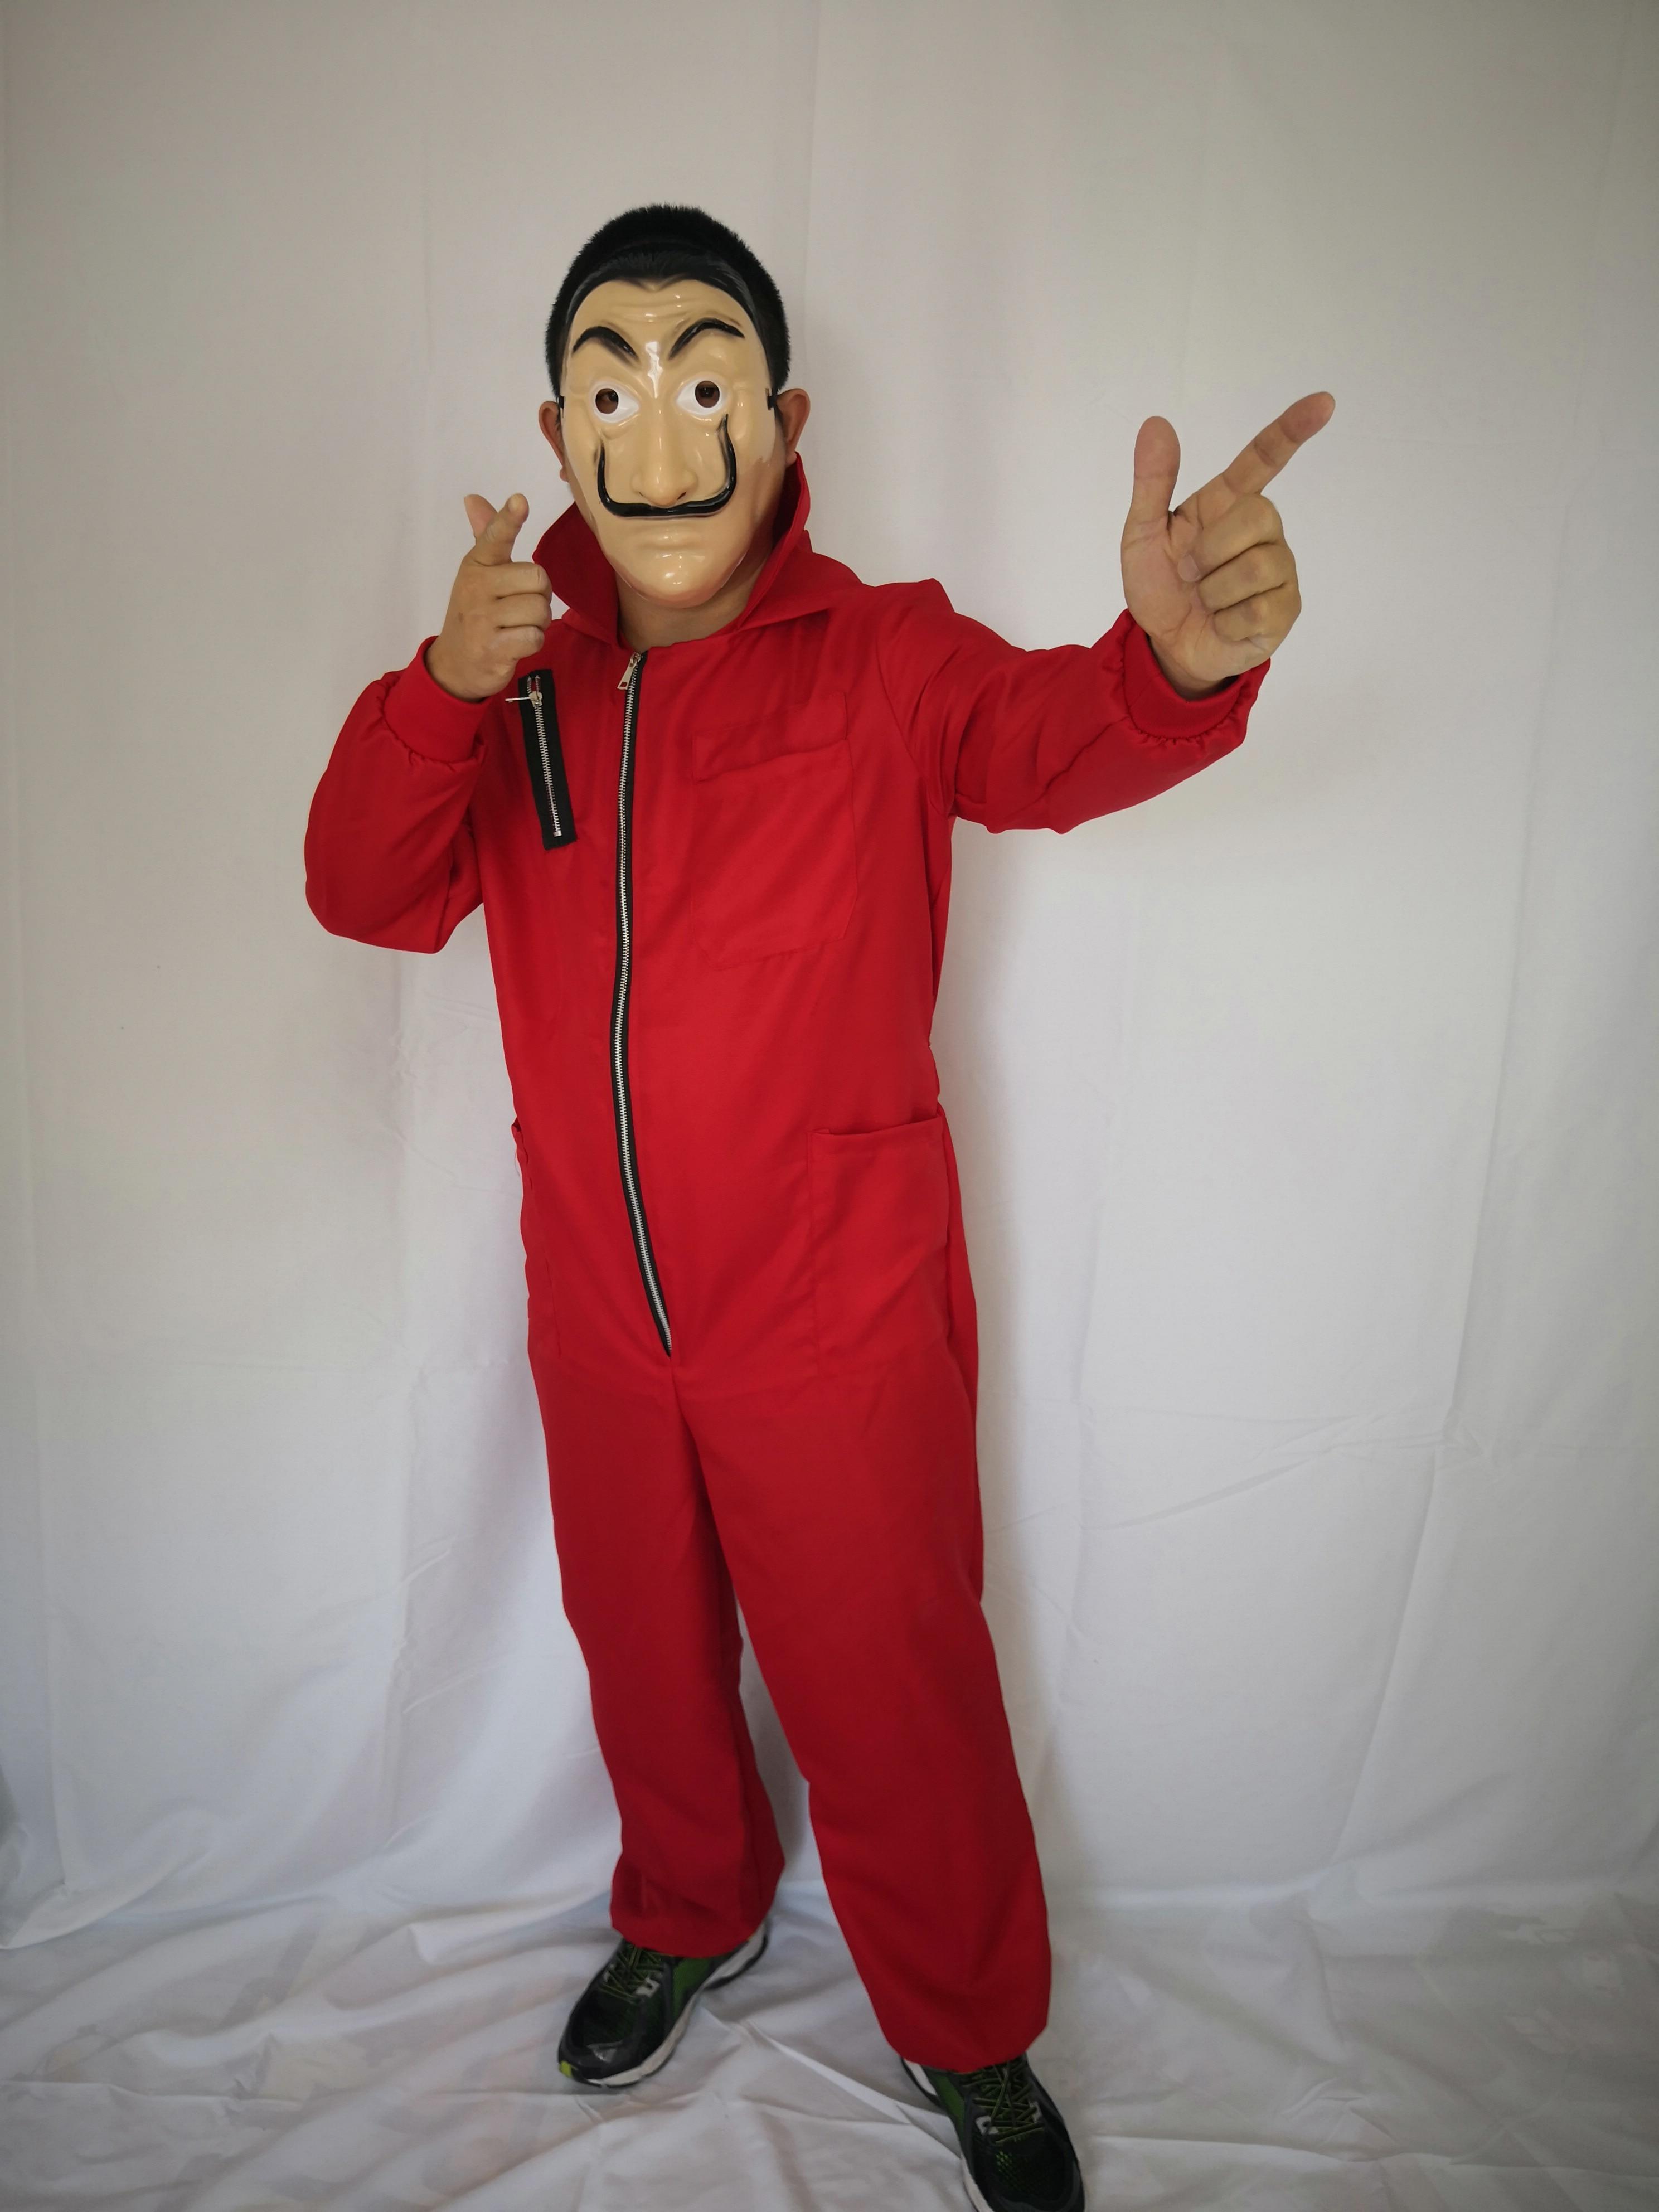 1pc comédia mestre la casa de papel dali máscara halloween masquerade cosplay acessórios engraçados